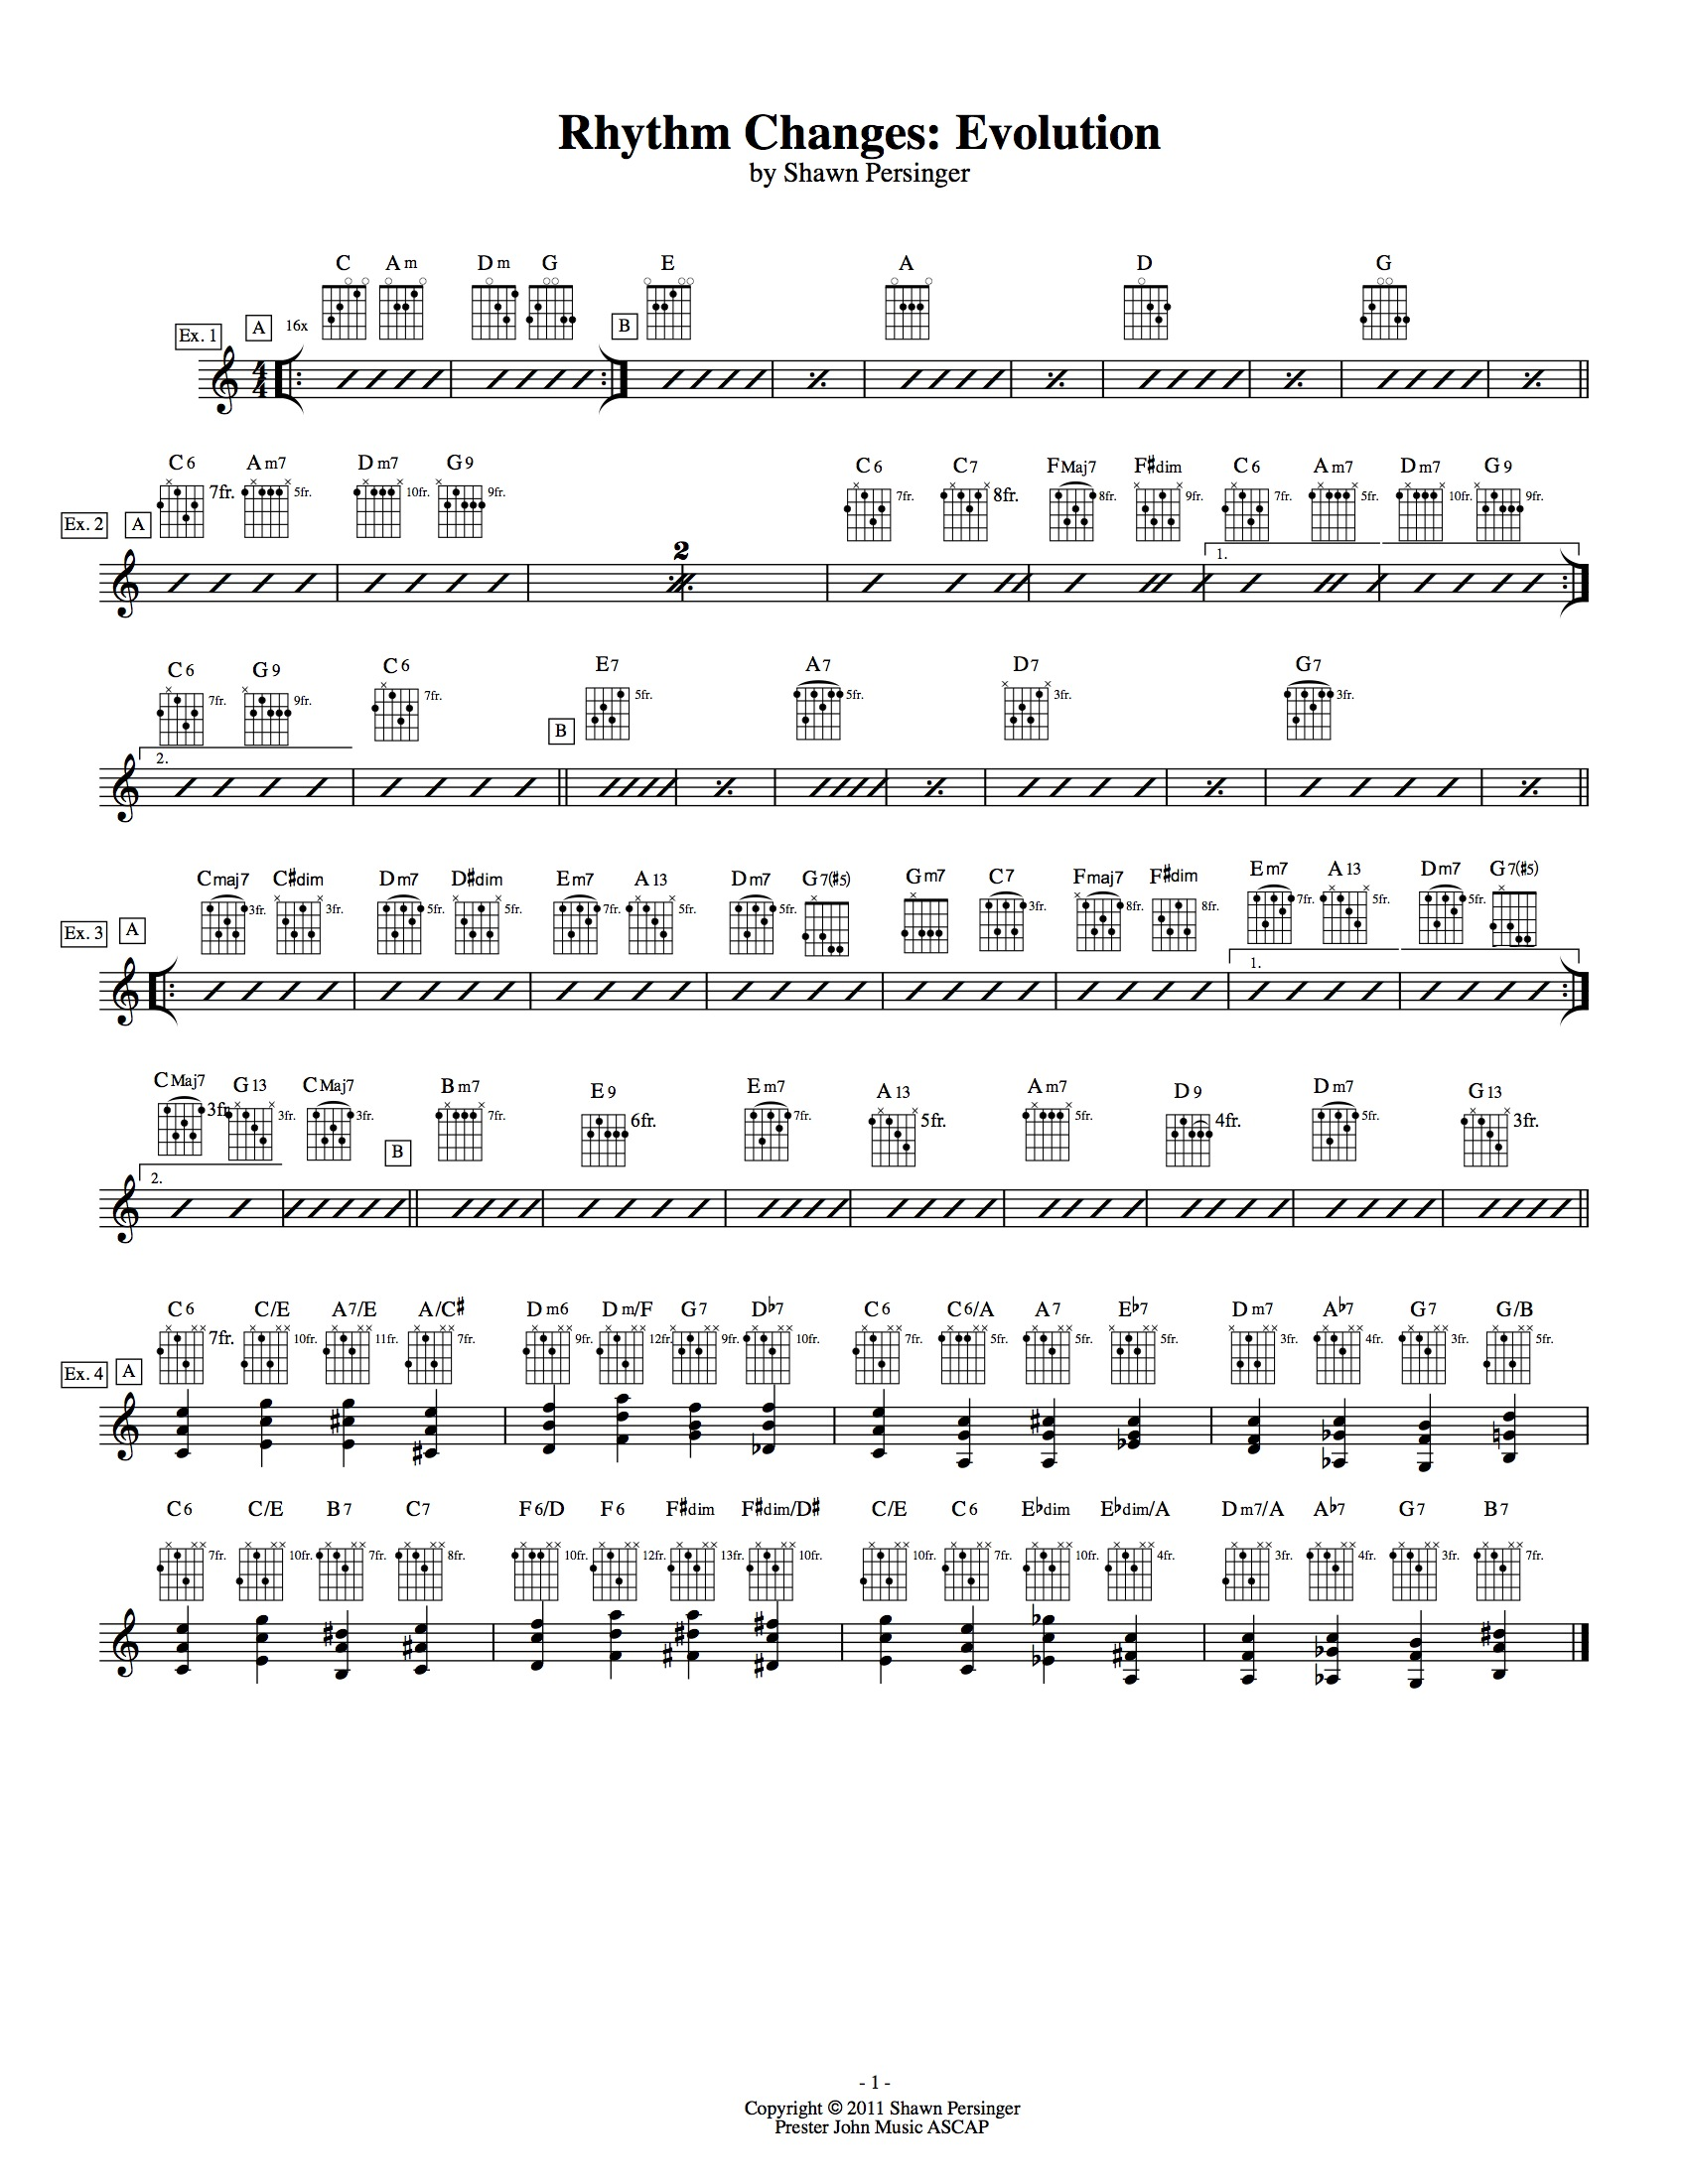 Rhythm Changes Evolution Taylor Guitars